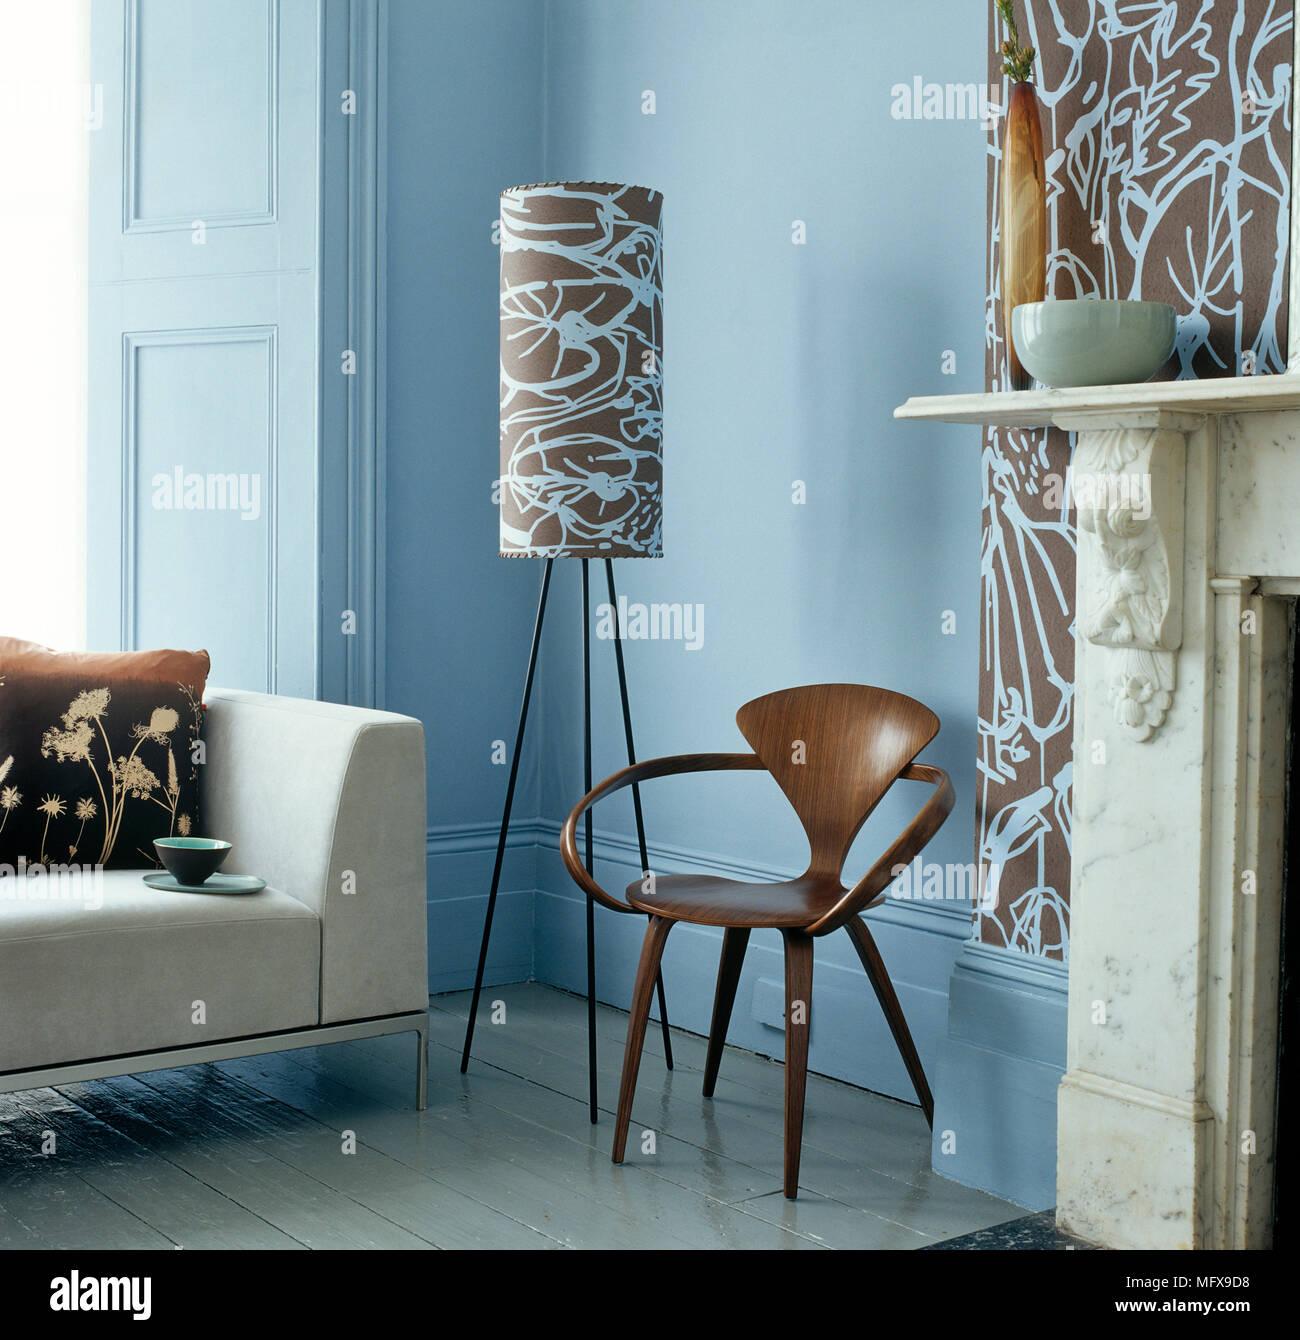 moderne stuhl neben lampe in der ecke